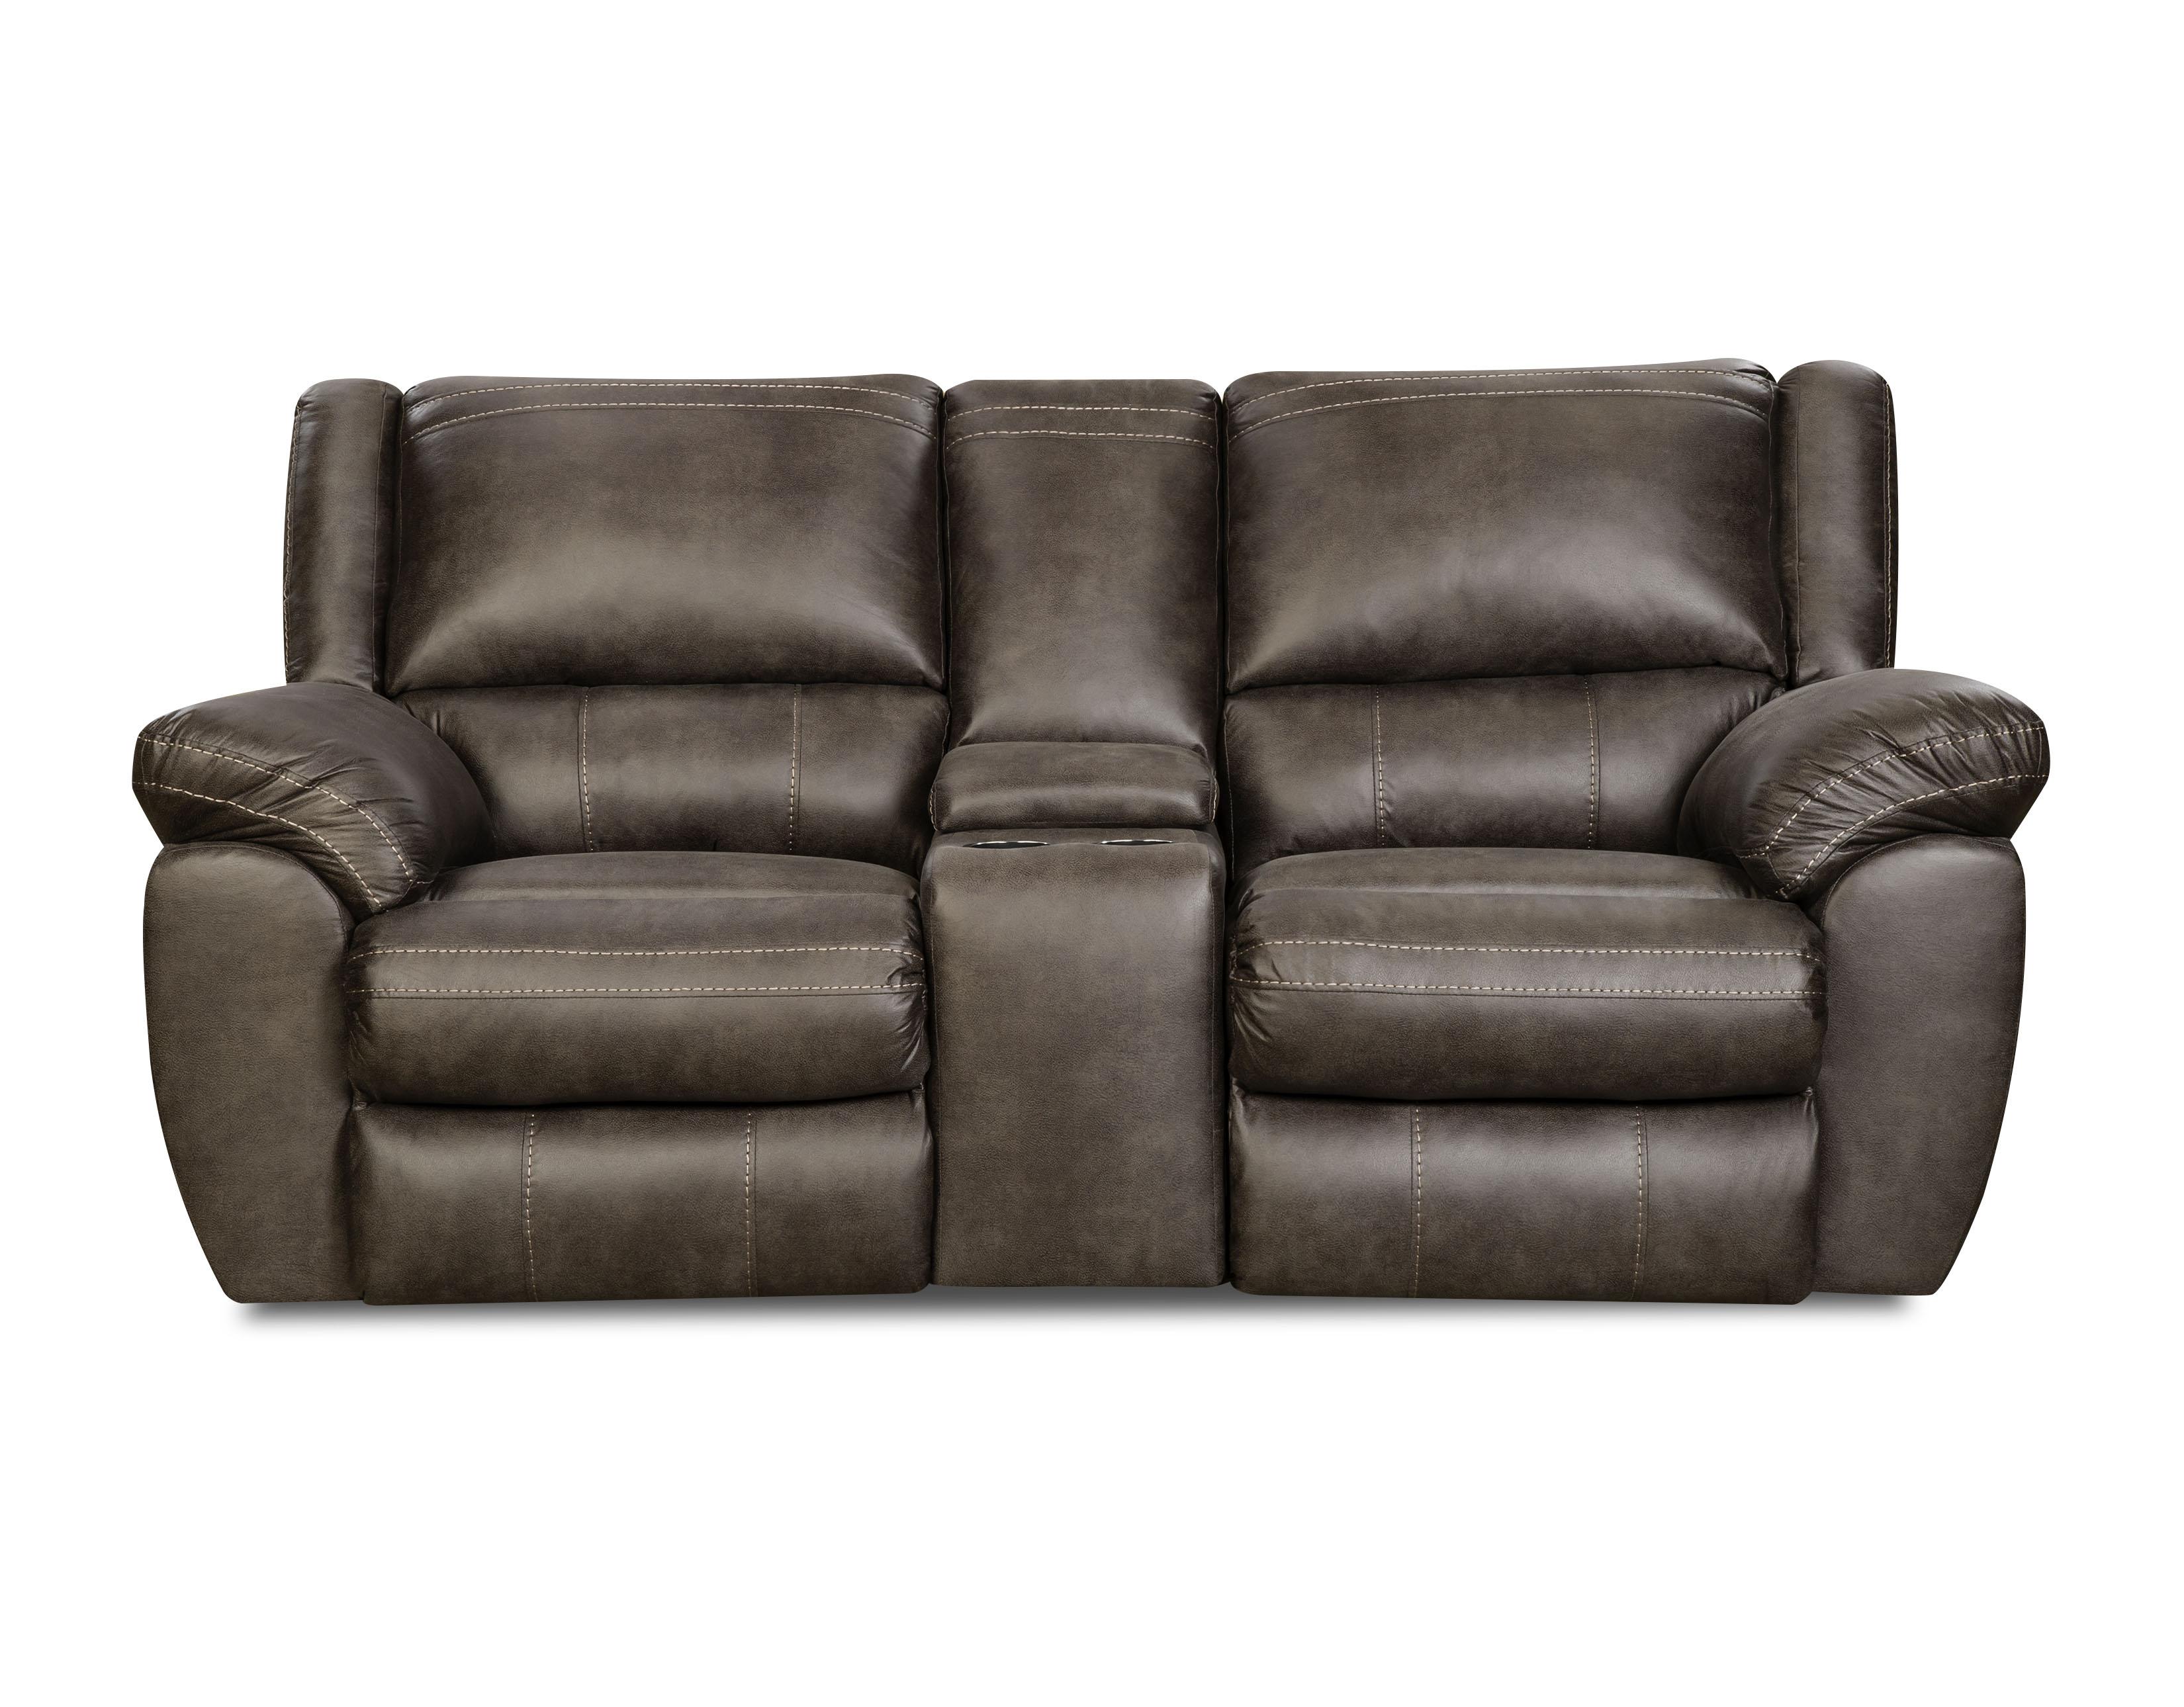 simmons beautyrest reclining sofa modern sofas atlanta mason loveseat shiloh granite shop